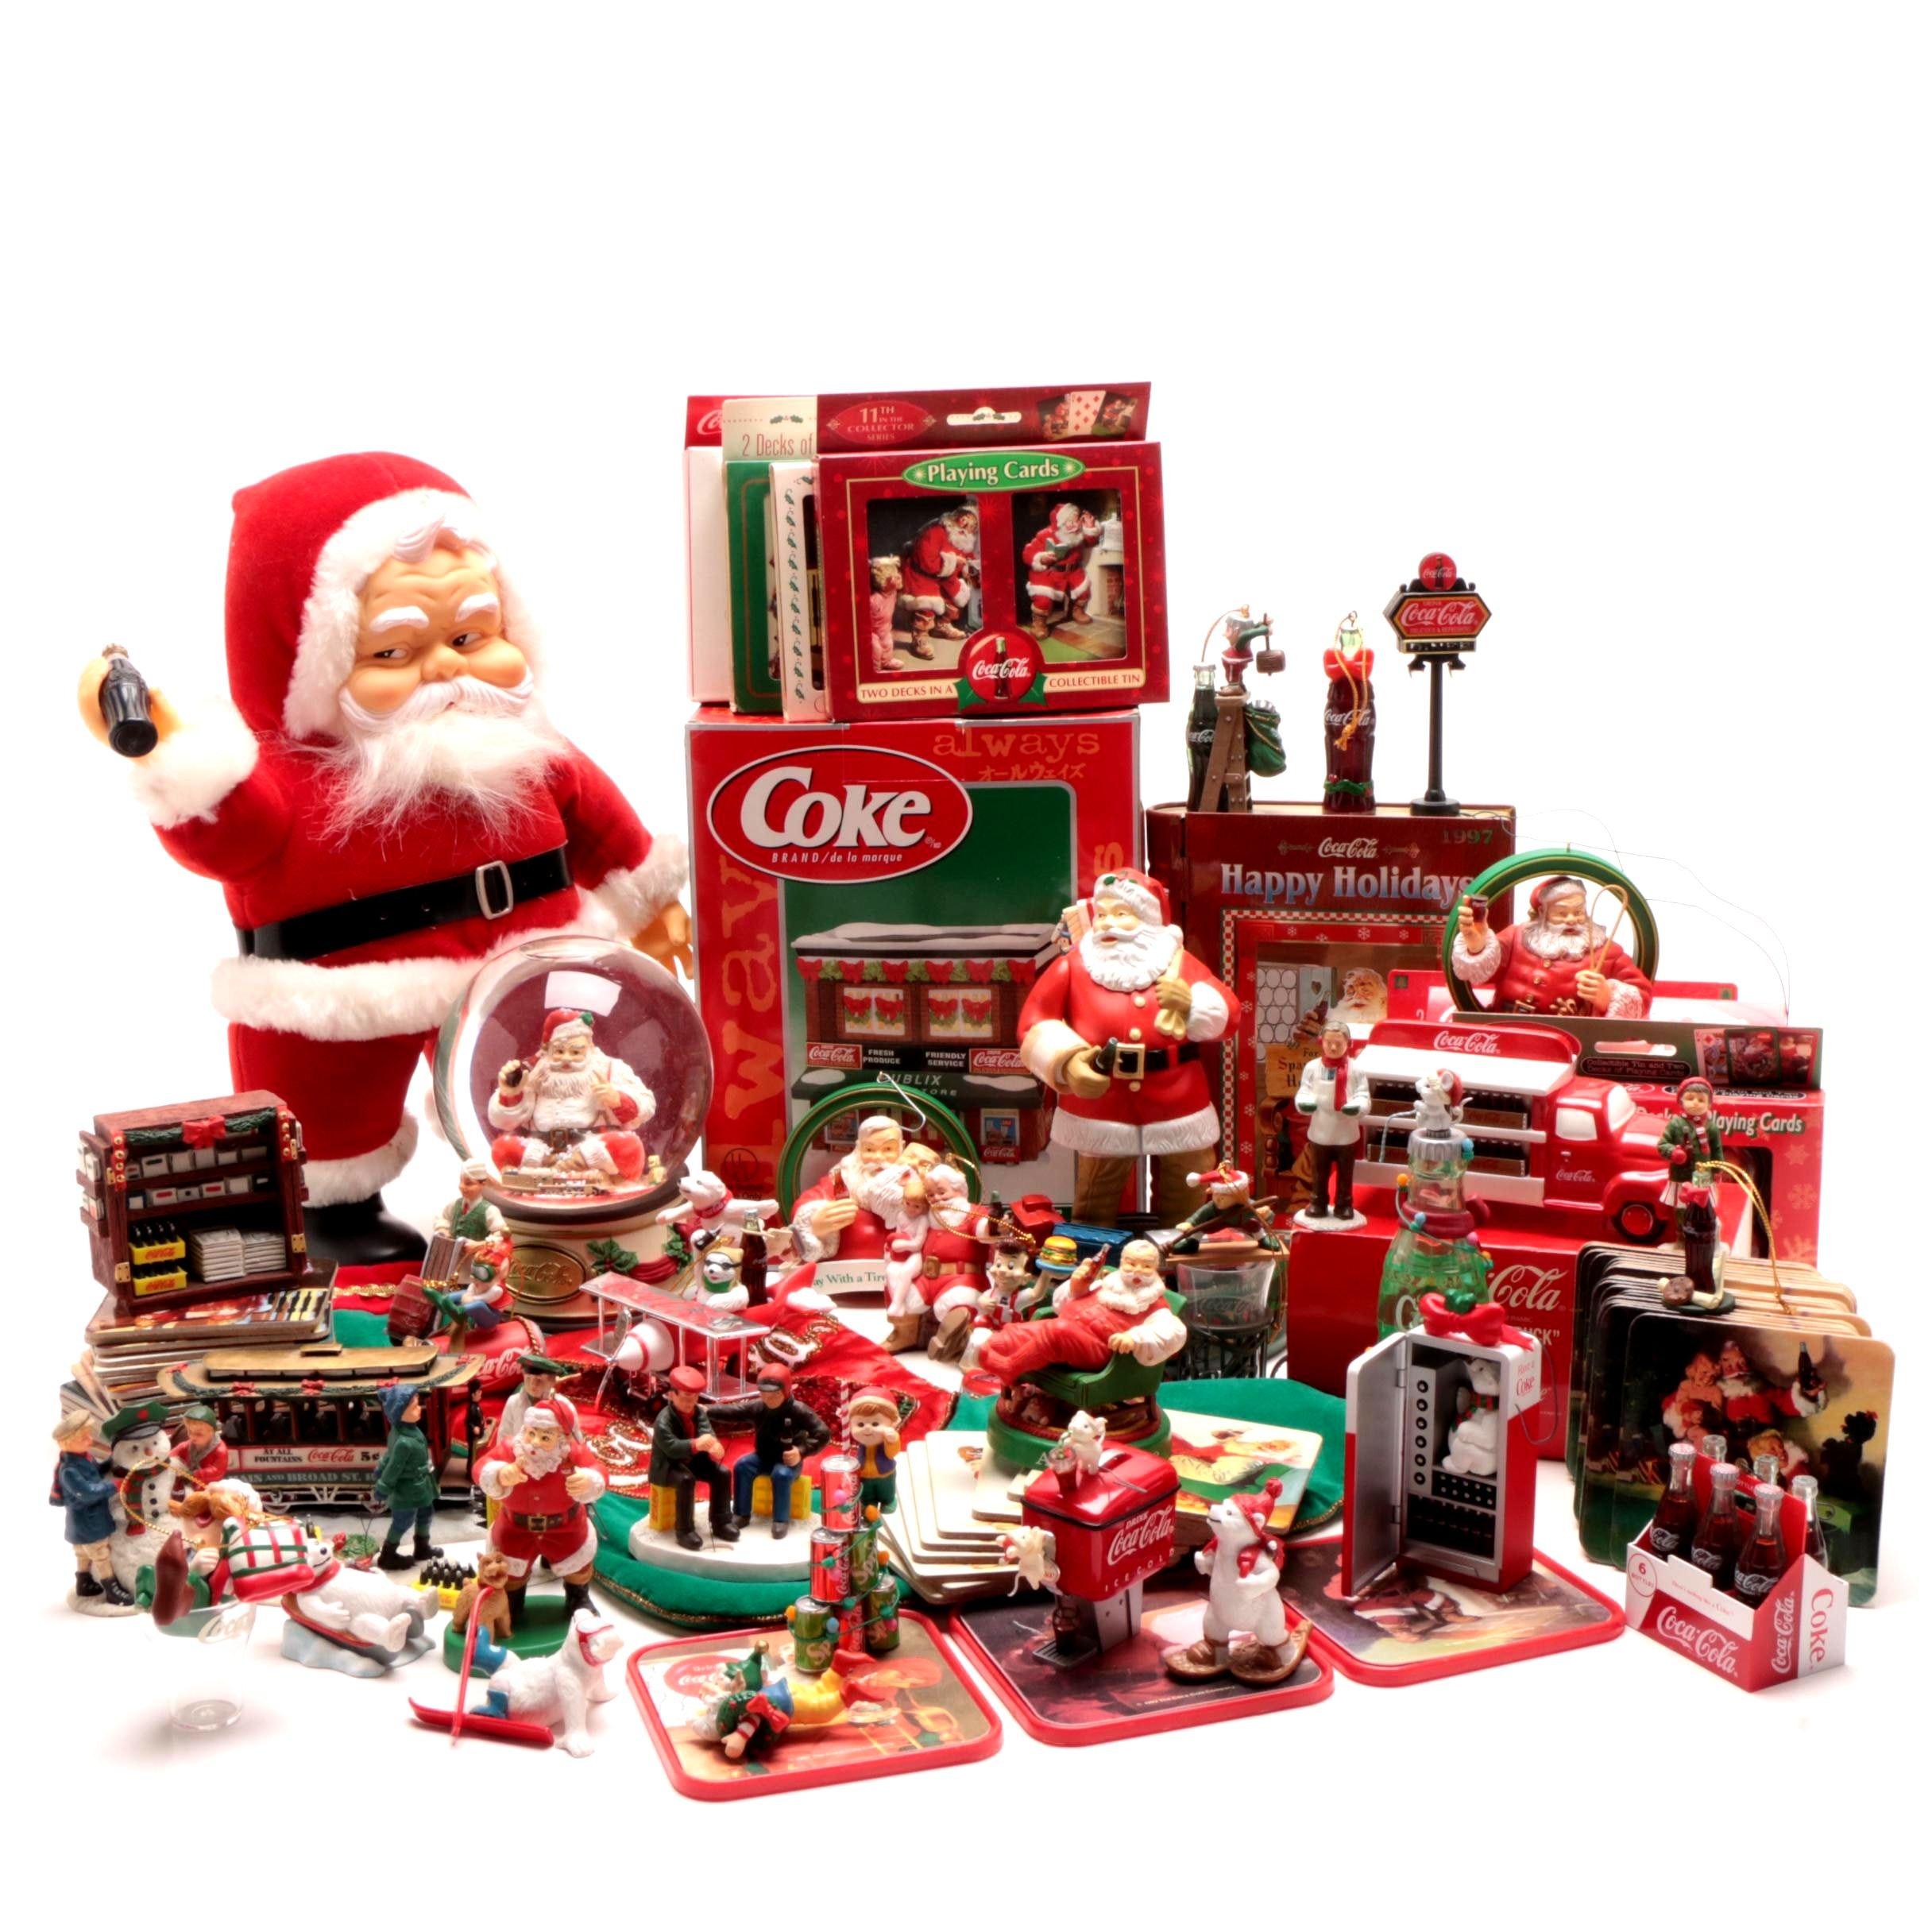 Coca-Cola Themed Winter and Christmas Decor